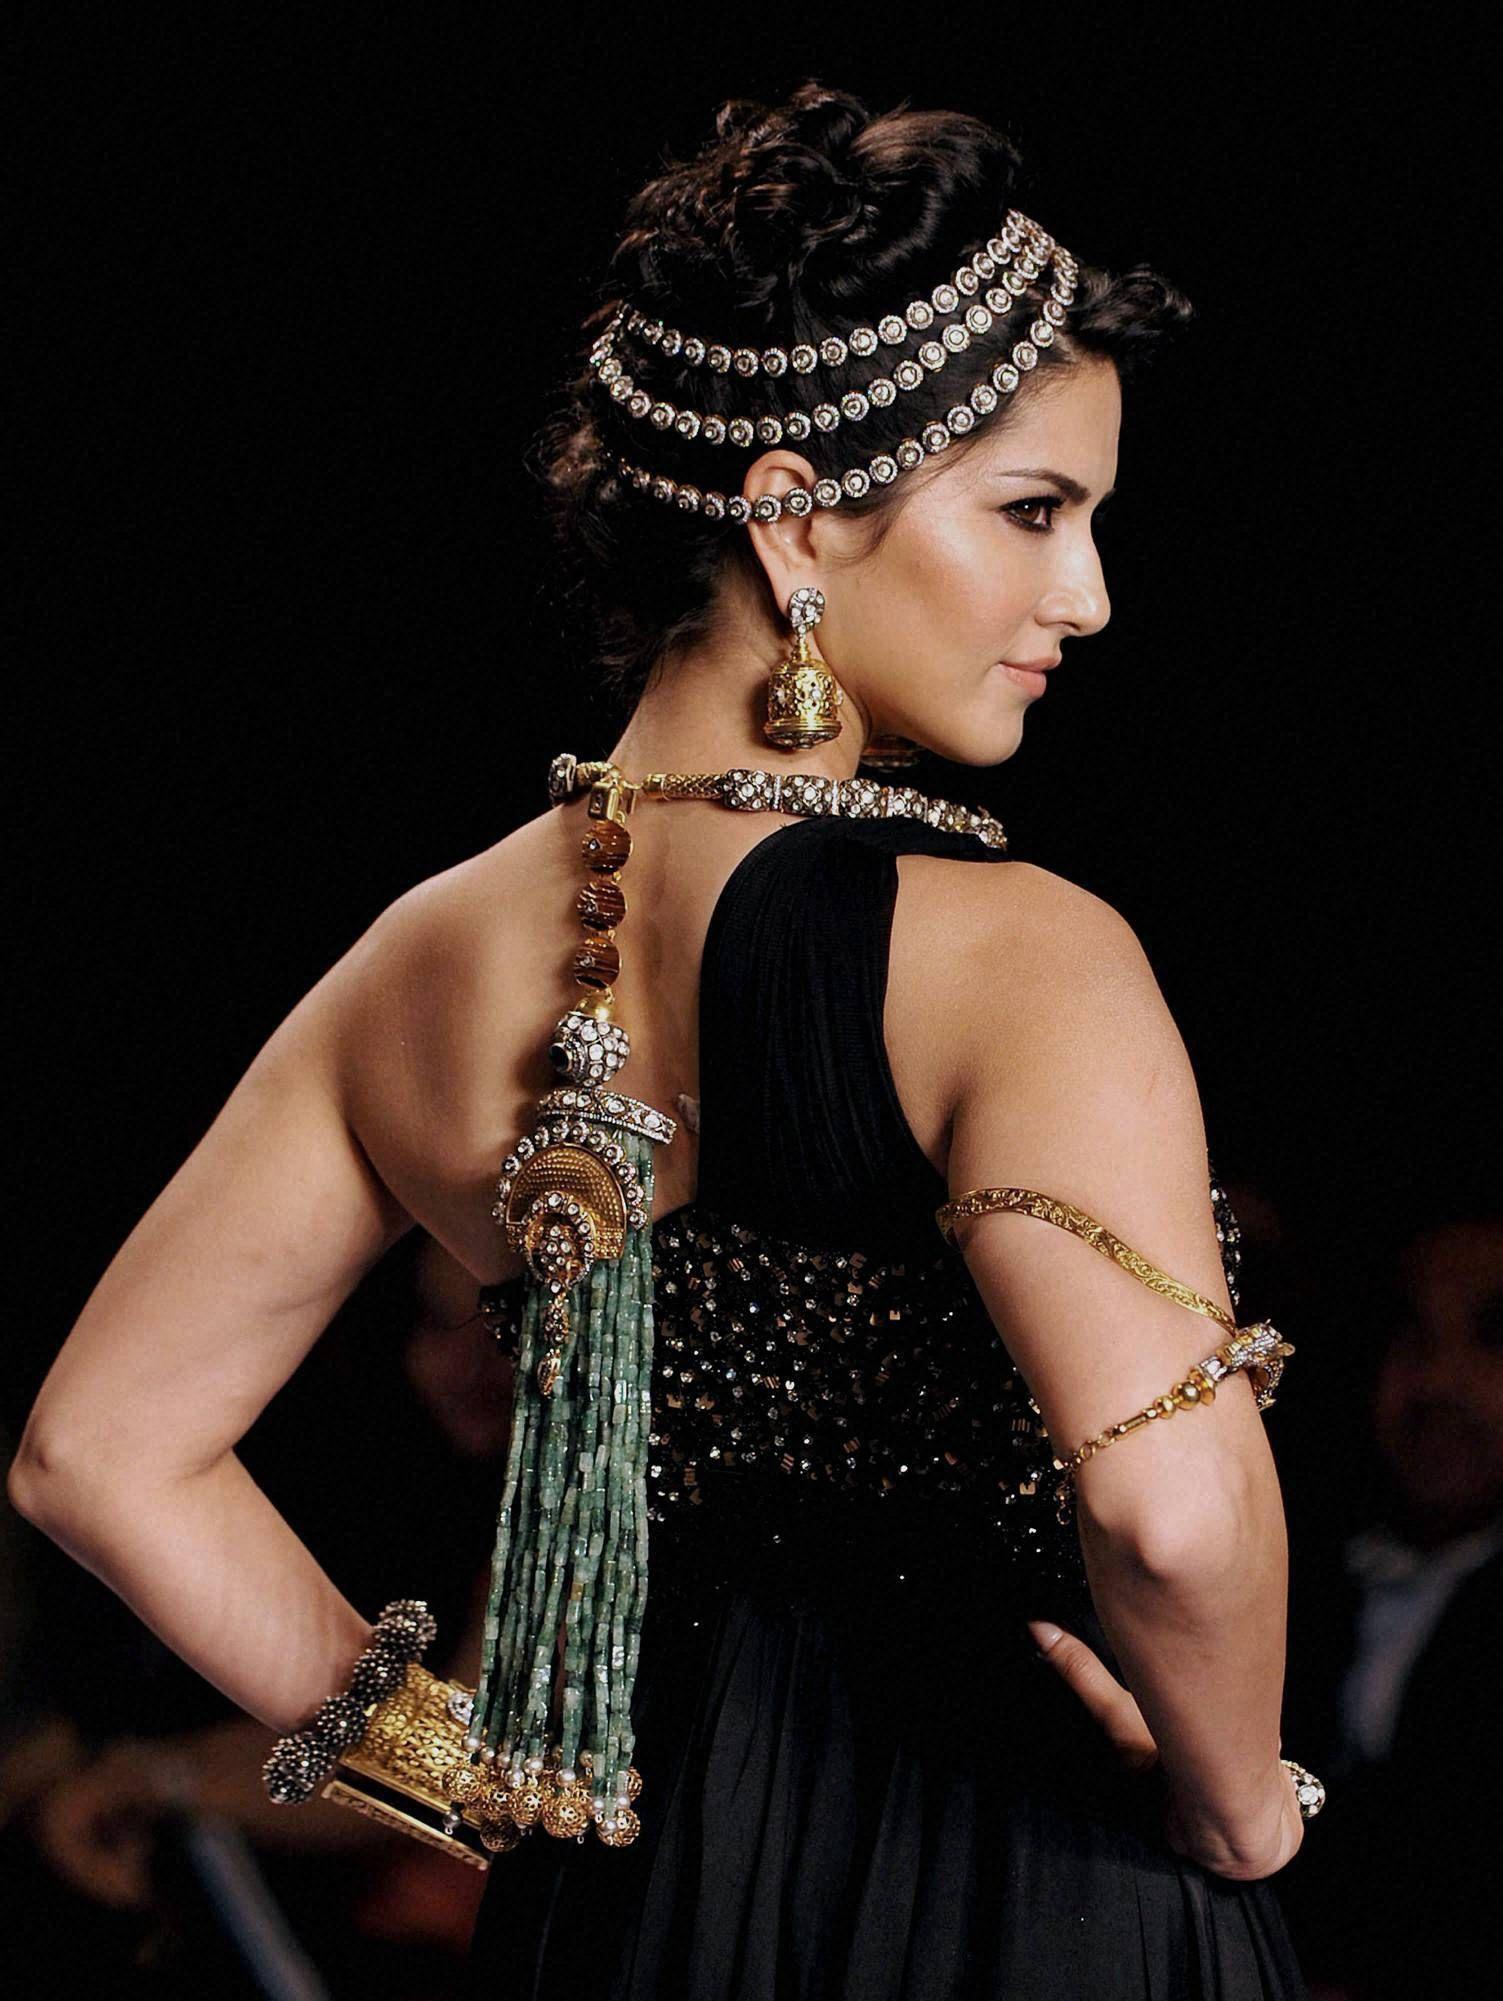 httpApalain Innovative Jewellery by designer Sumit Sawhney